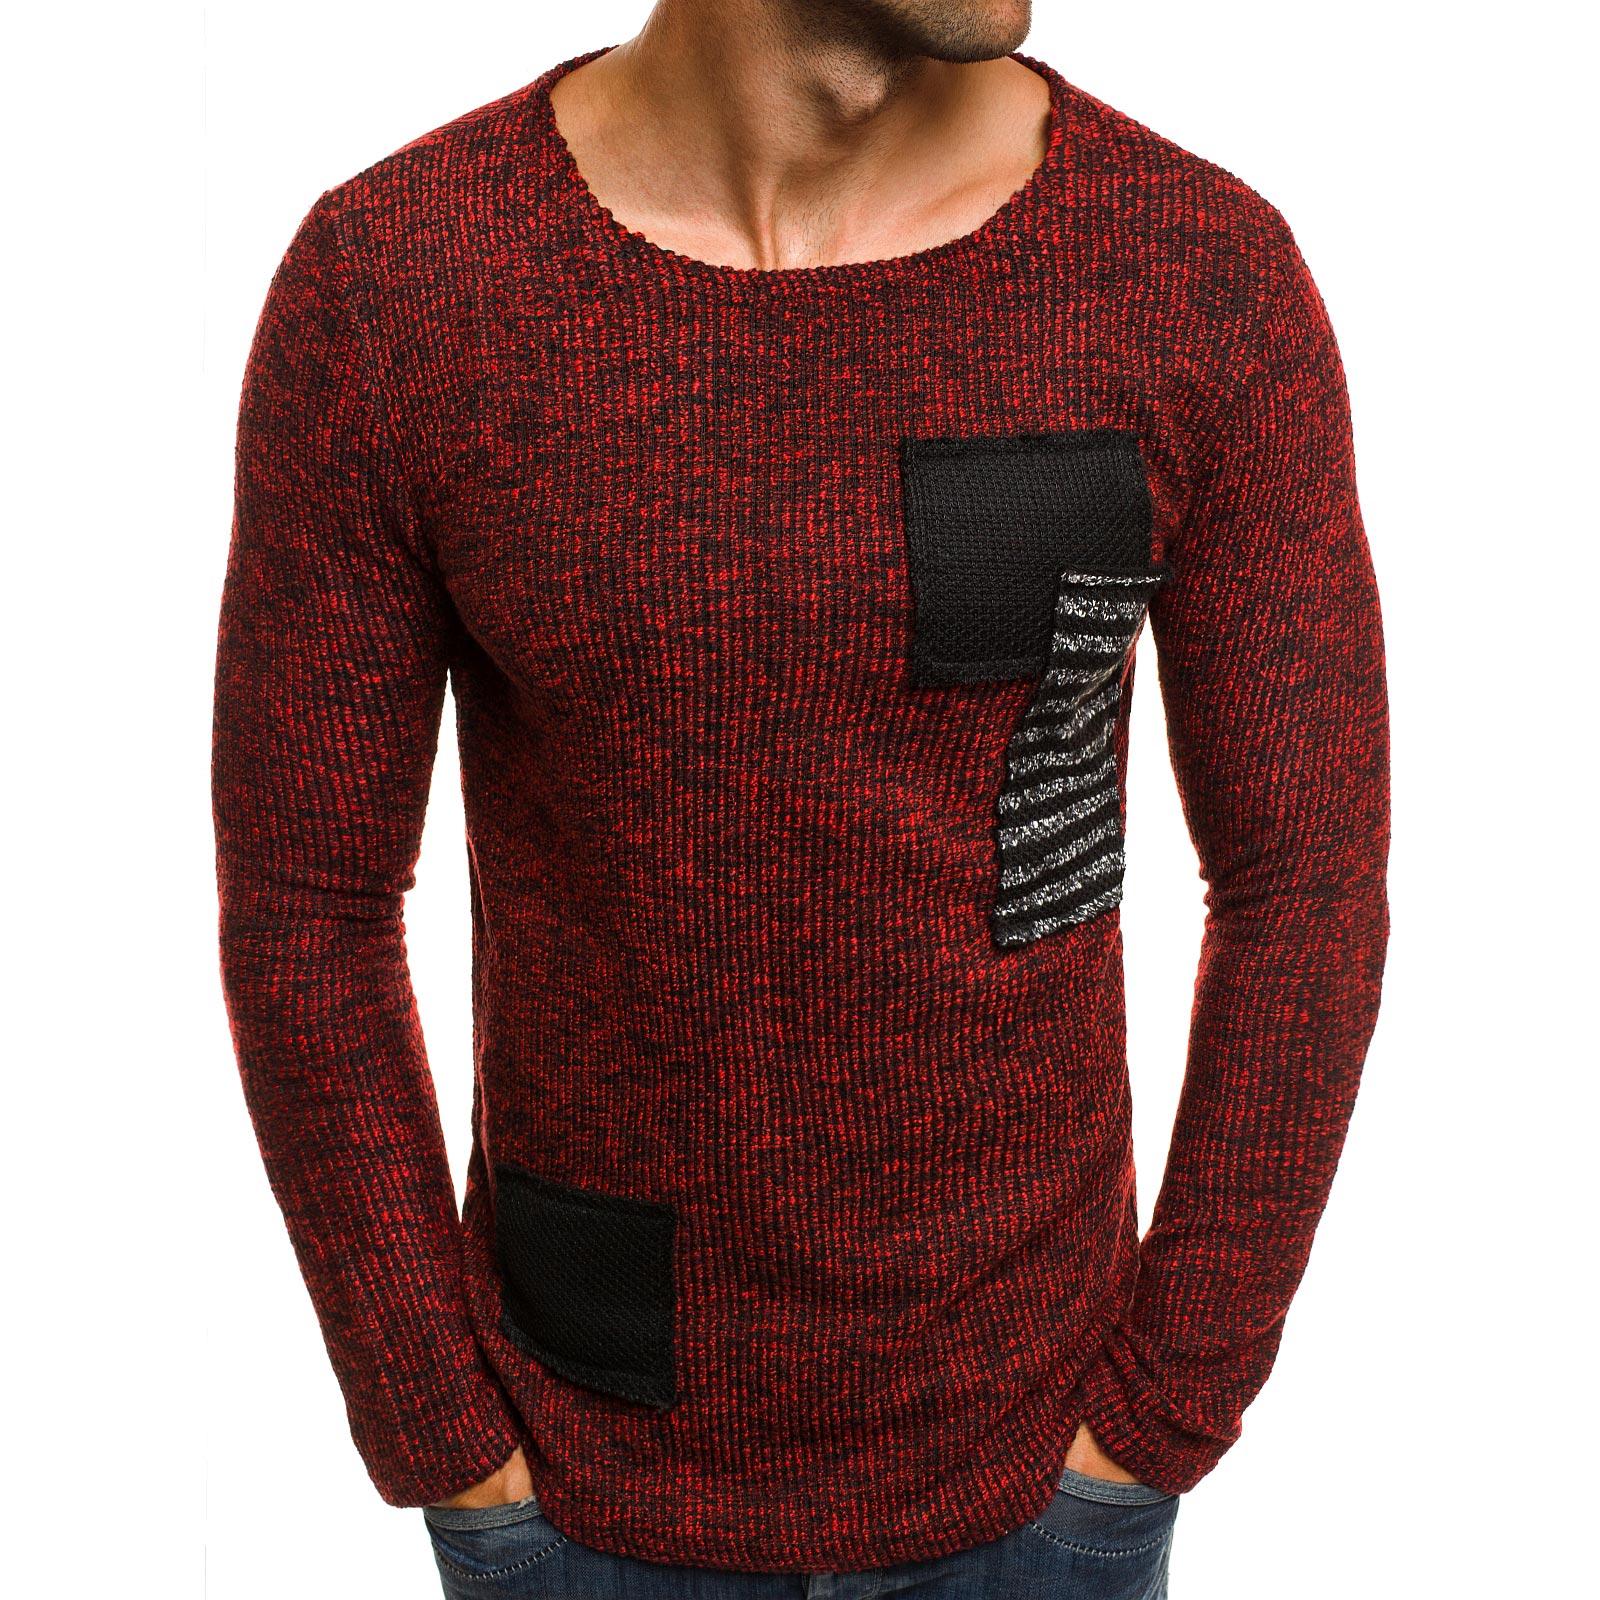 OZONEE-Herren-Pullover-Strickpullover-Longsleeve-Stricken-Sweater-Pulli-1165-MIX